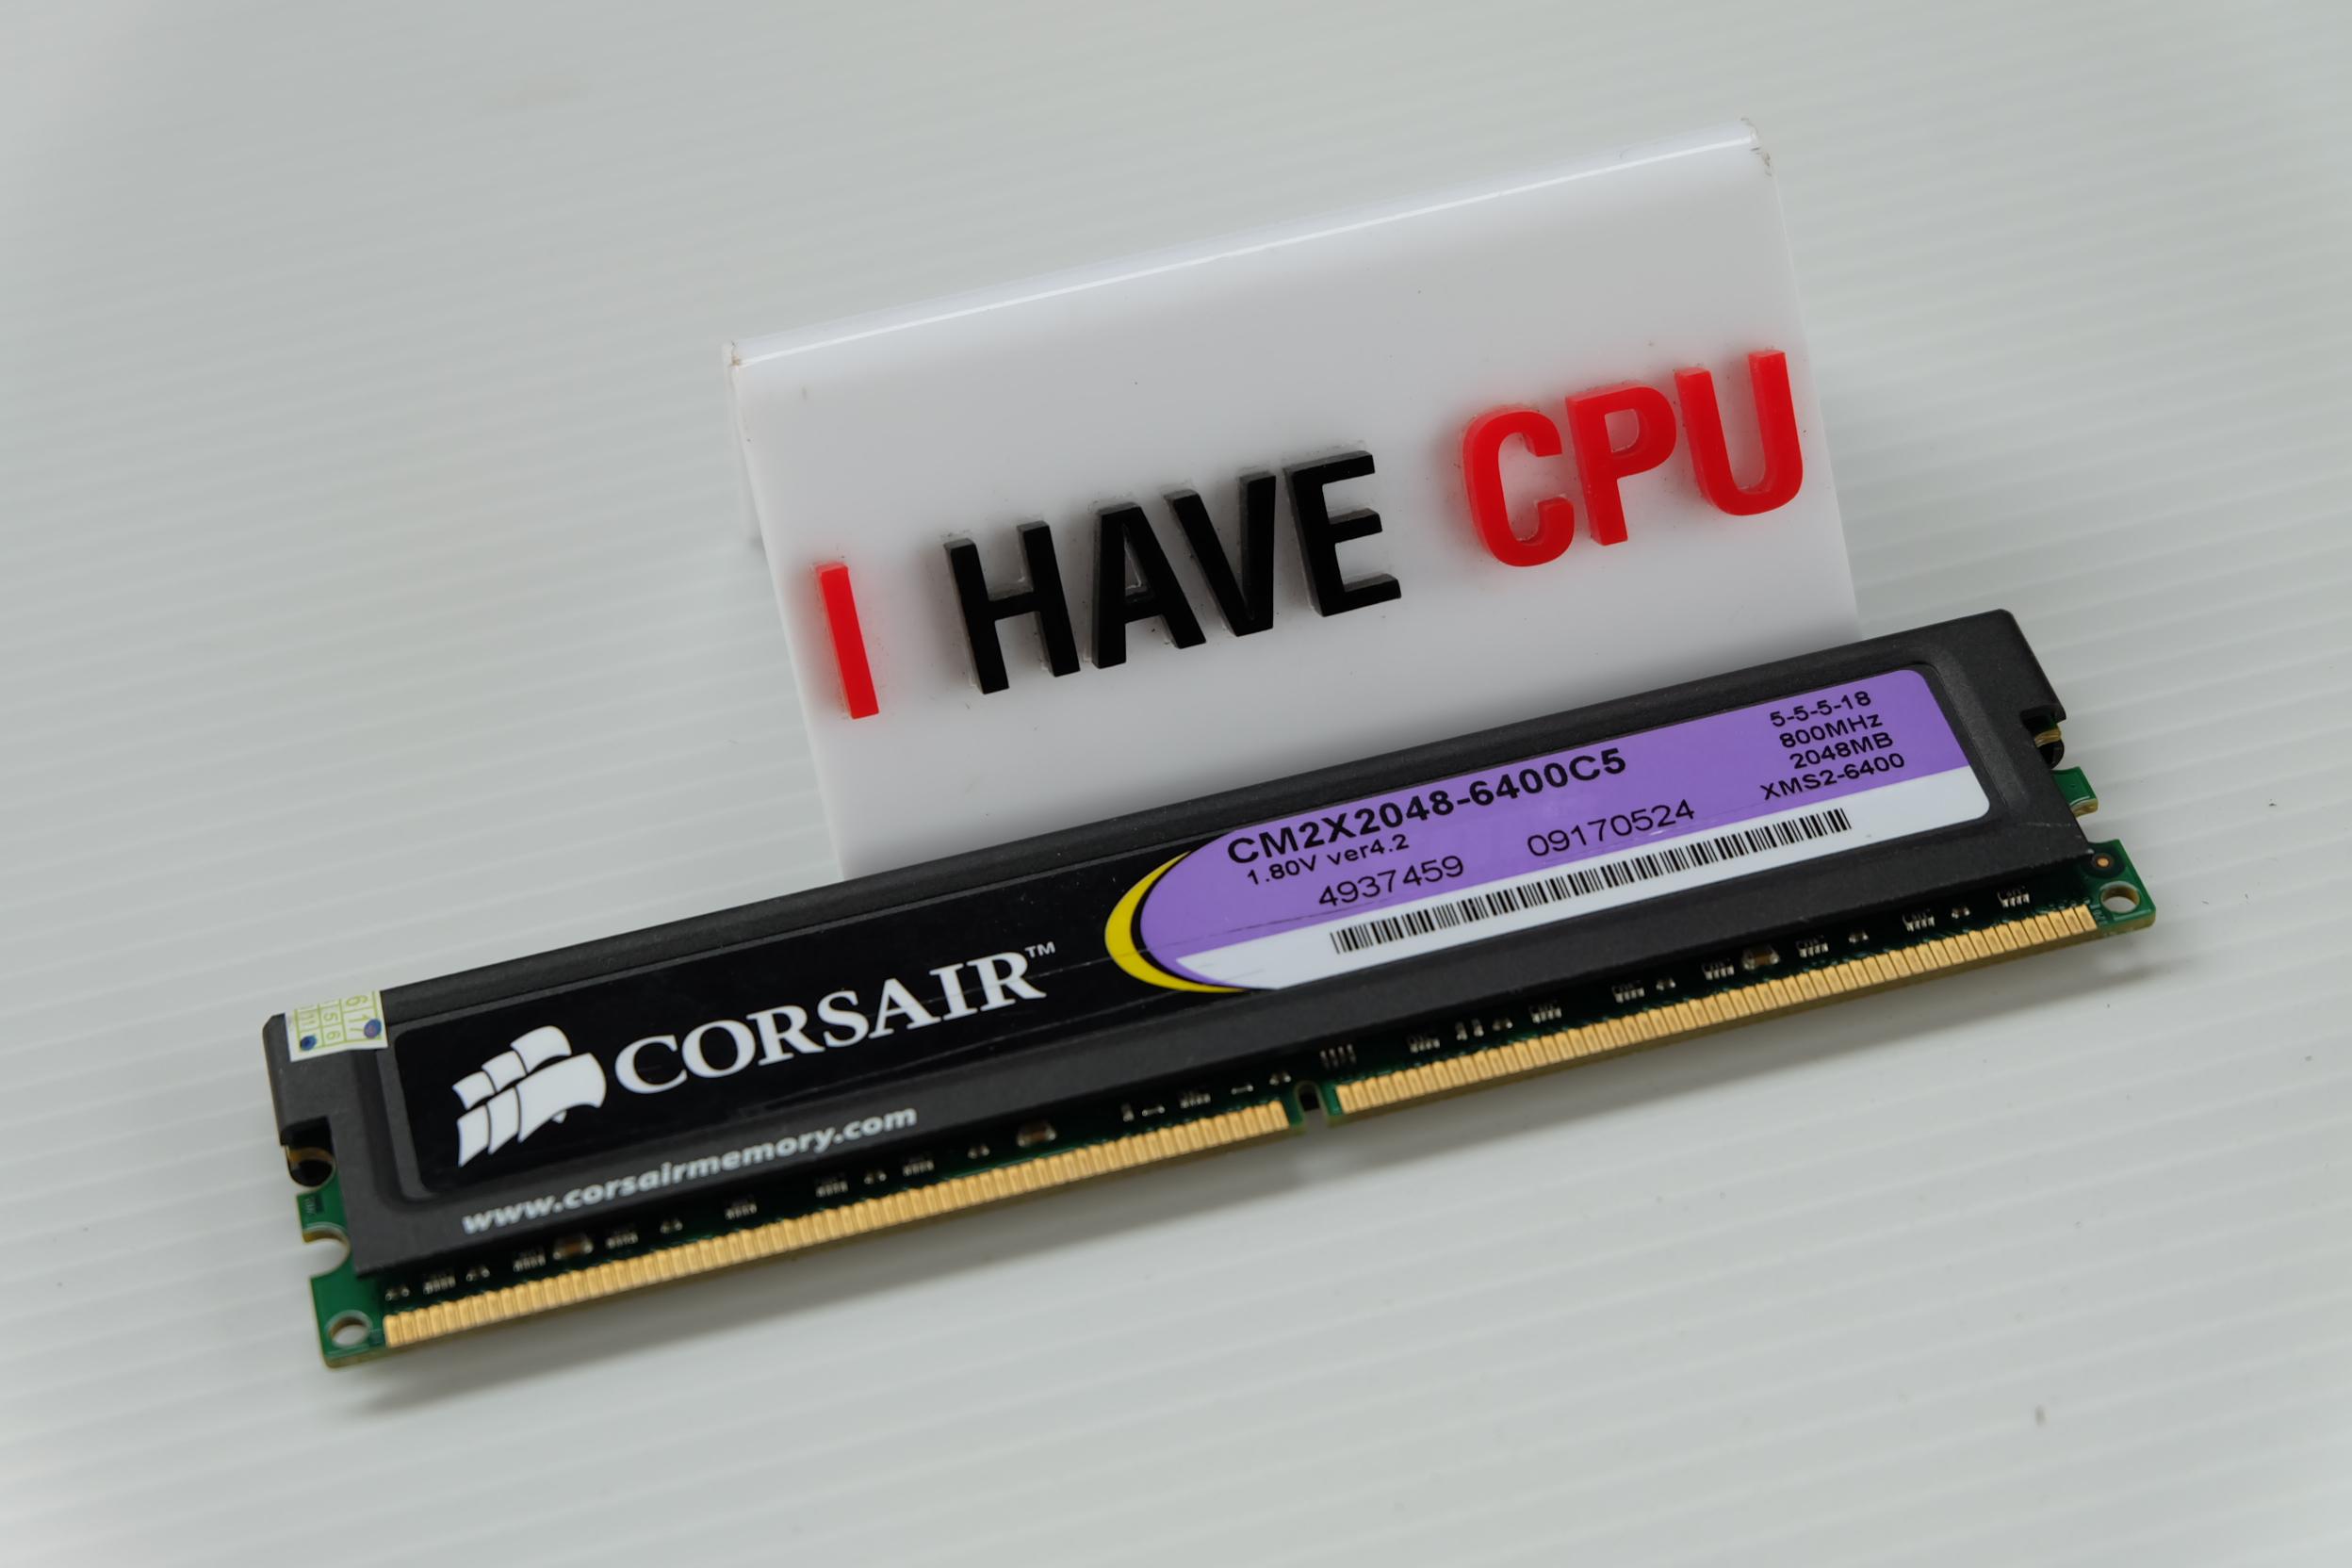 CORSAIR 2GB DDR2 800MHZ XM2S